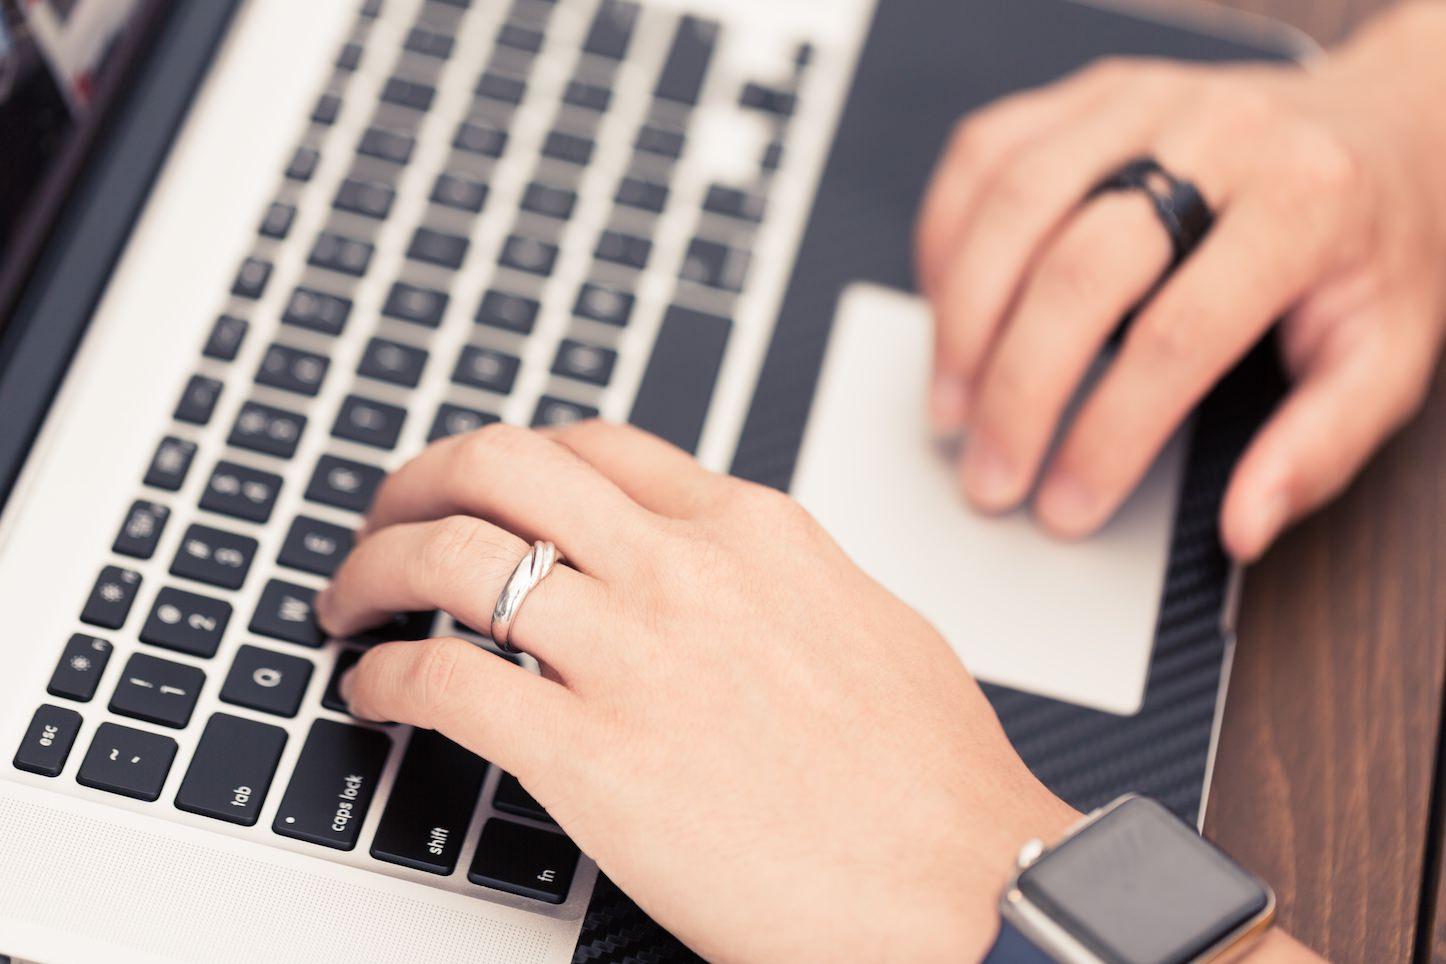 Macbook trackpad and keyboard